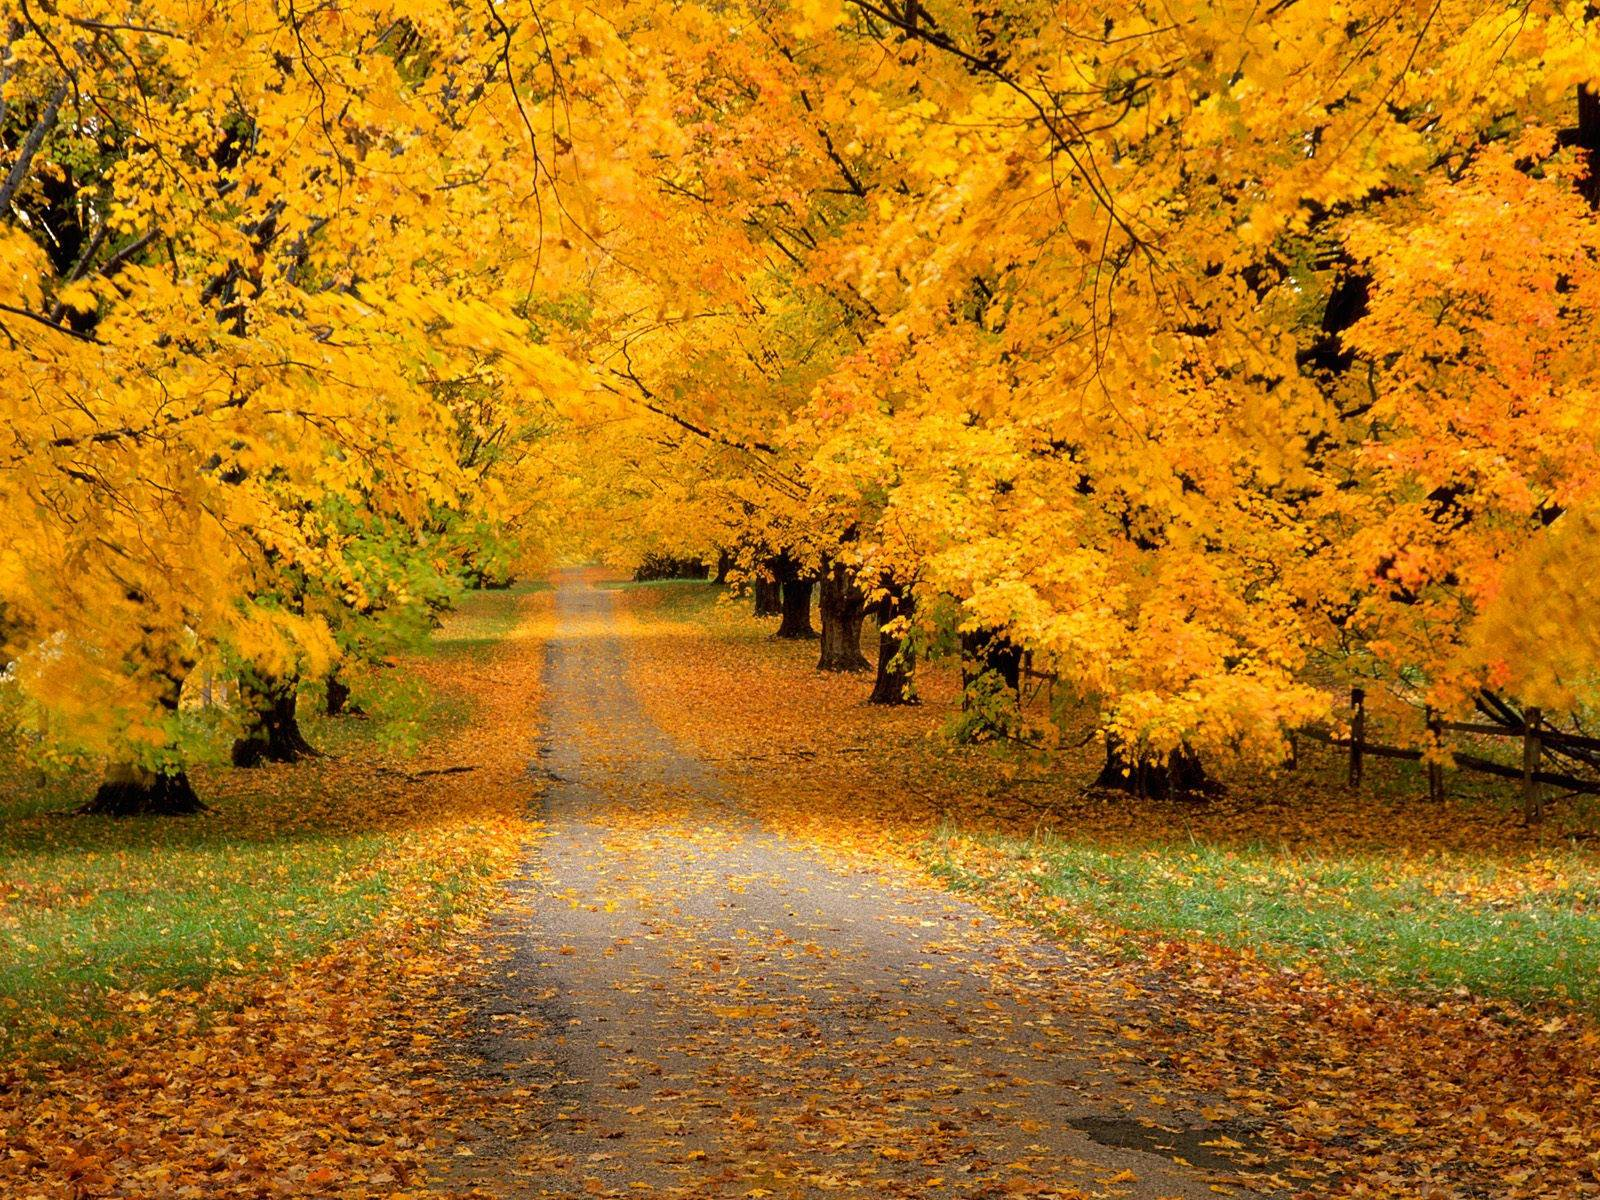 http://4.bp.blogspot.com/-usfmw5XtvwA/TwVNyg2SfpI/AAAAAAAAGZw/2Kaz5kATu5Q/s1600/autumn_covered_road.jpg